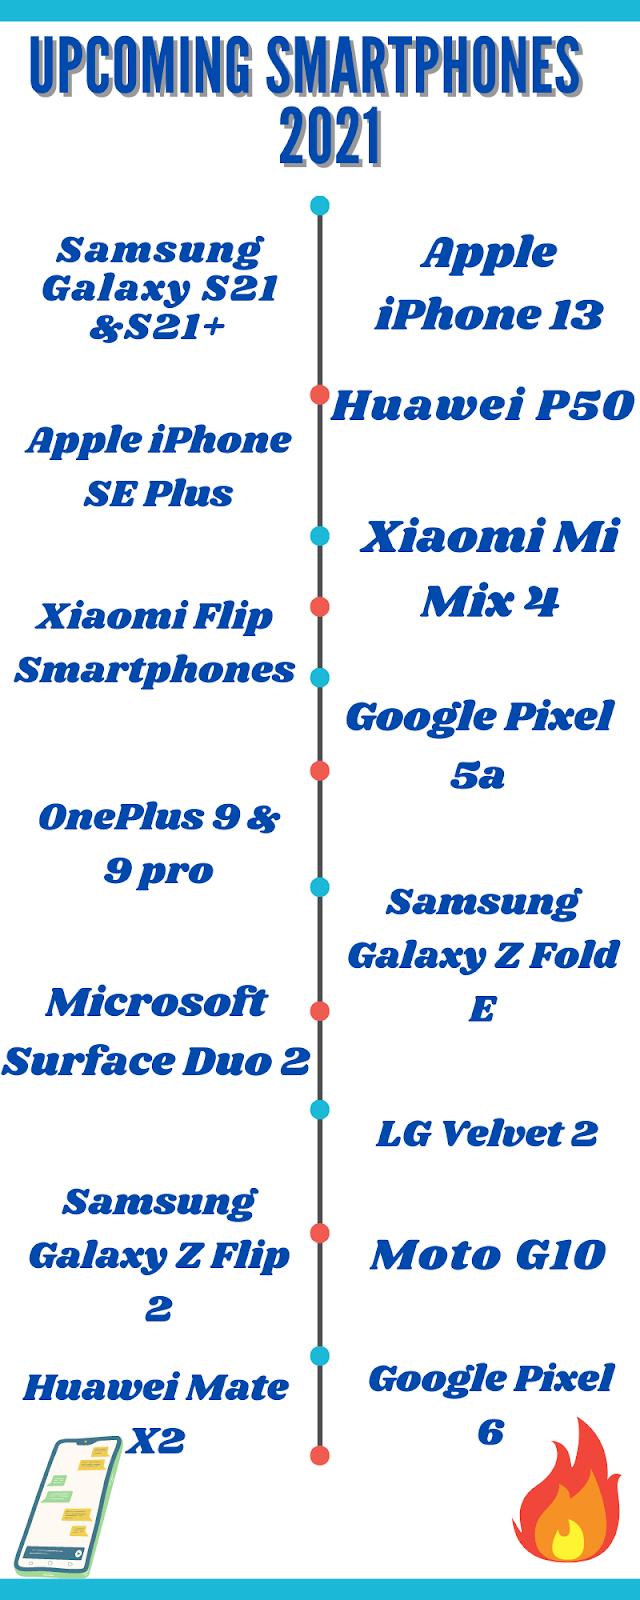 Upcoming Smartphones 2021 Infograph